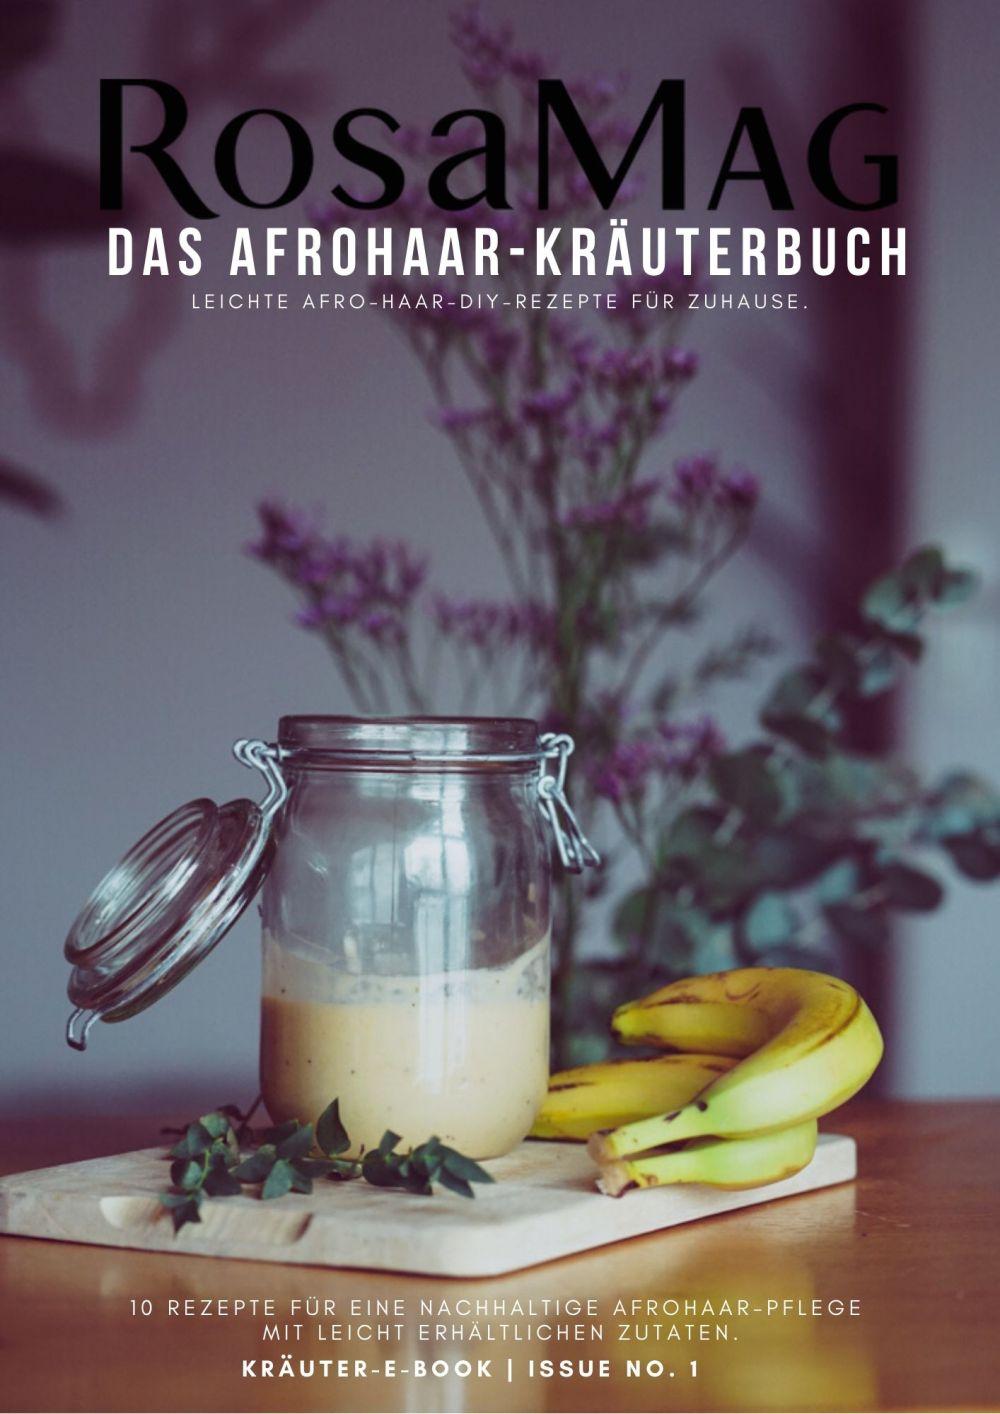 Afro-haar-pflege-e-book-Rosa-mag-afro-haar-kräuter-diy-rezepte